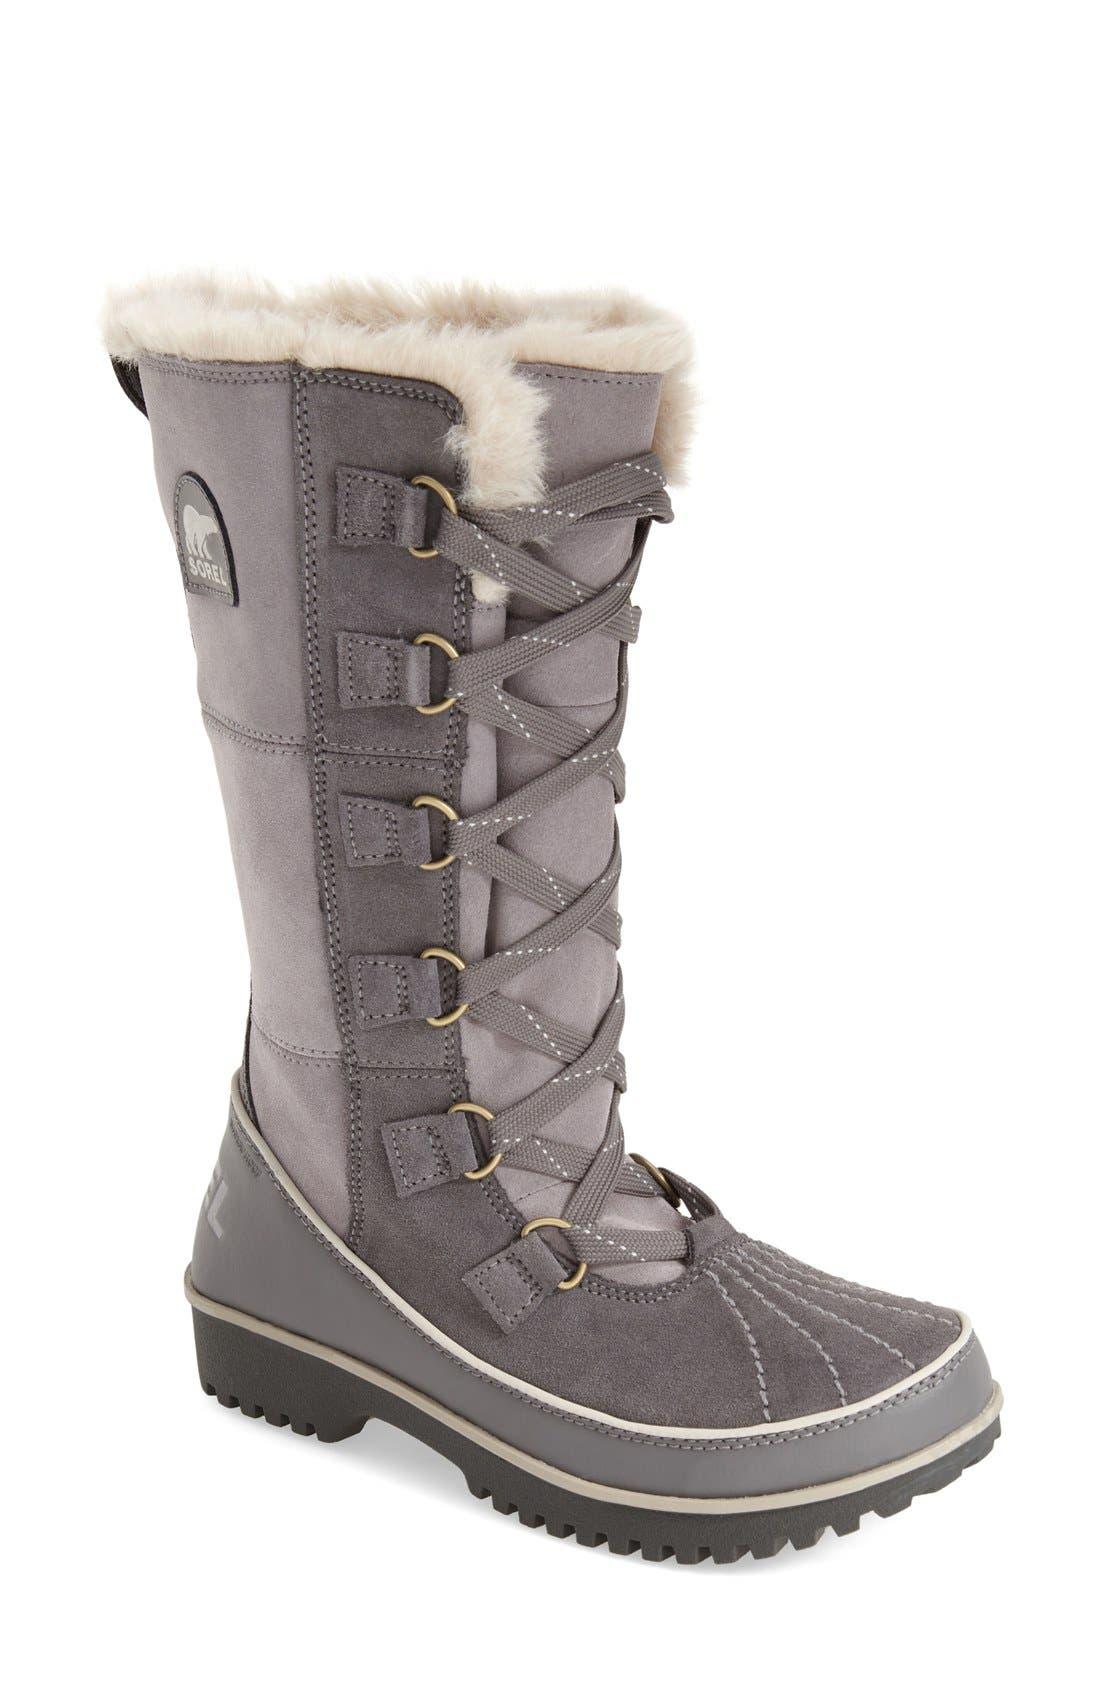 Alternate Image 1 Selected - SOREL 'Tivoli High II' Boot (Women)